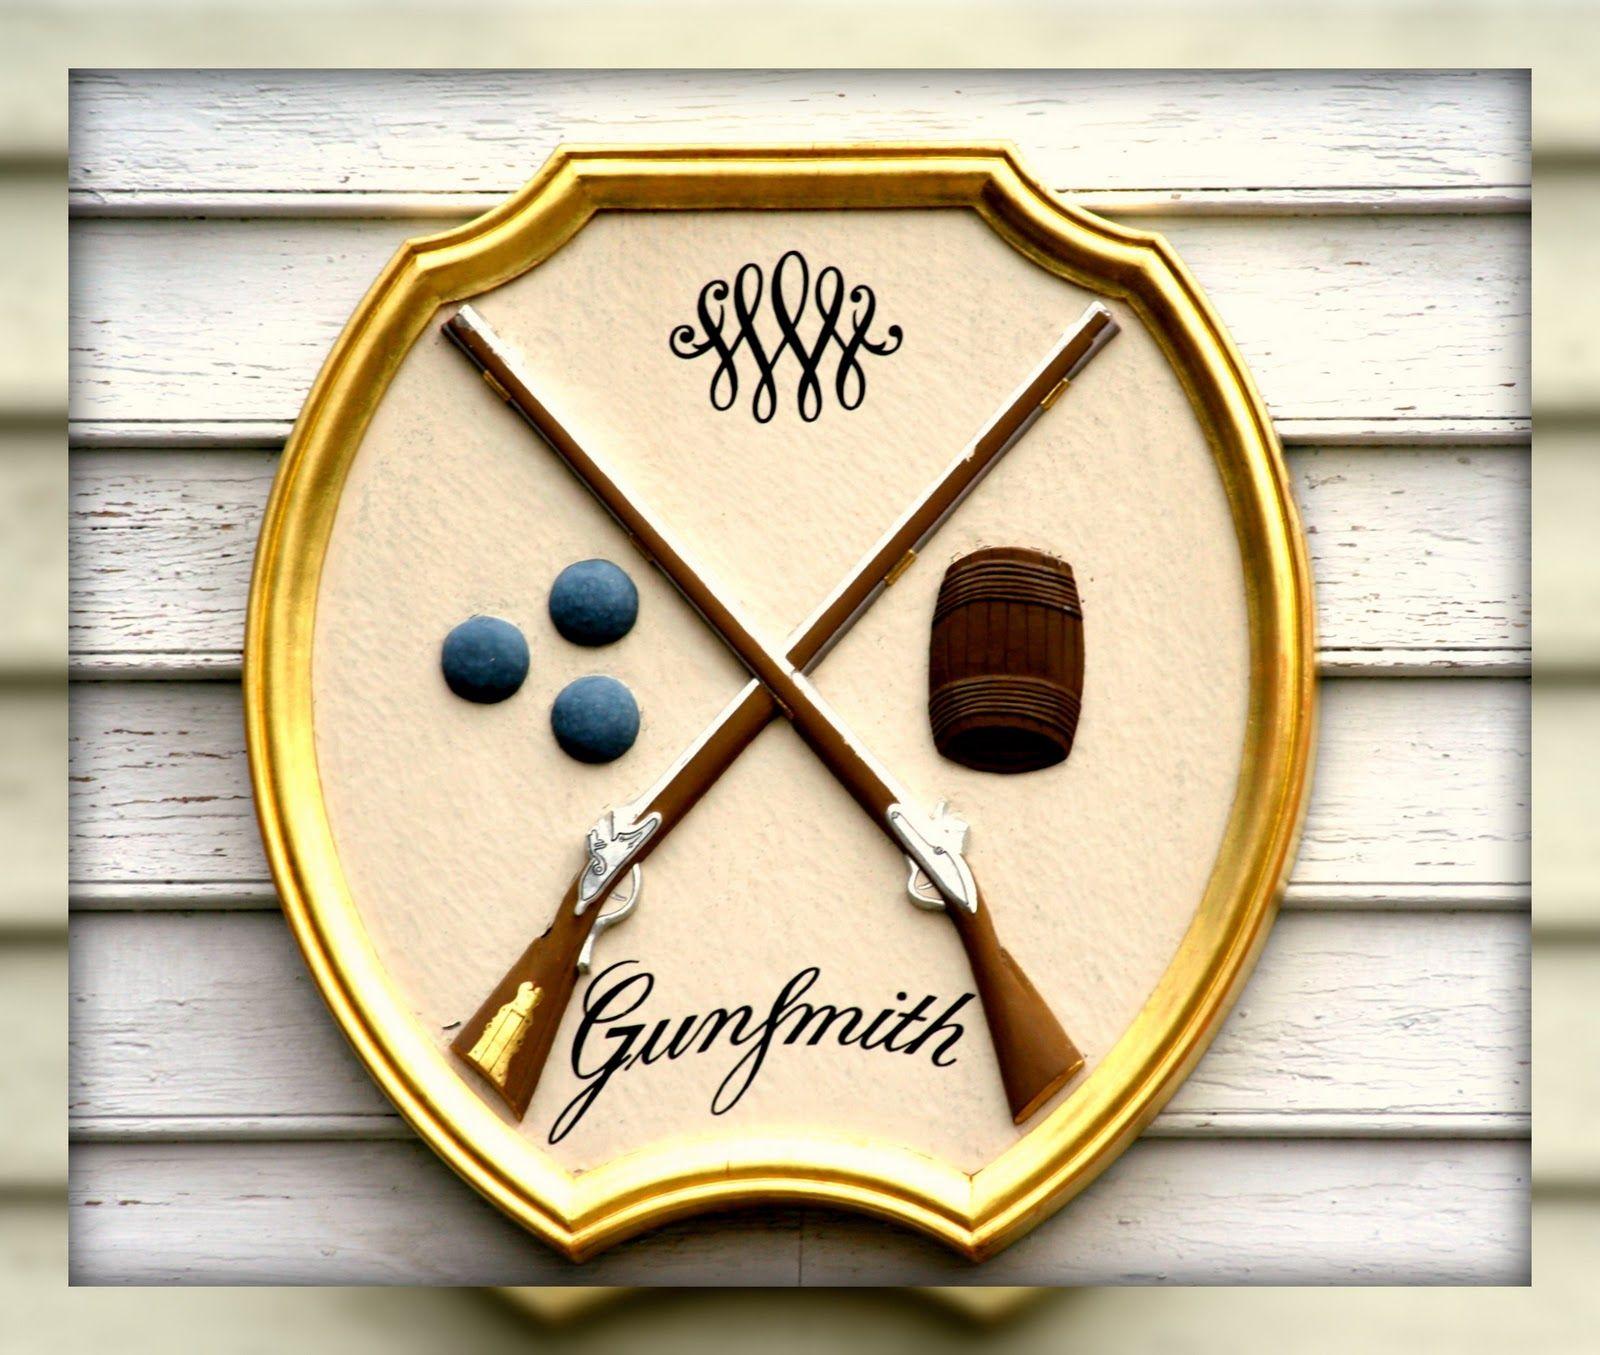 Gunsmith Sign Colonial Williamsburg Williamsburg